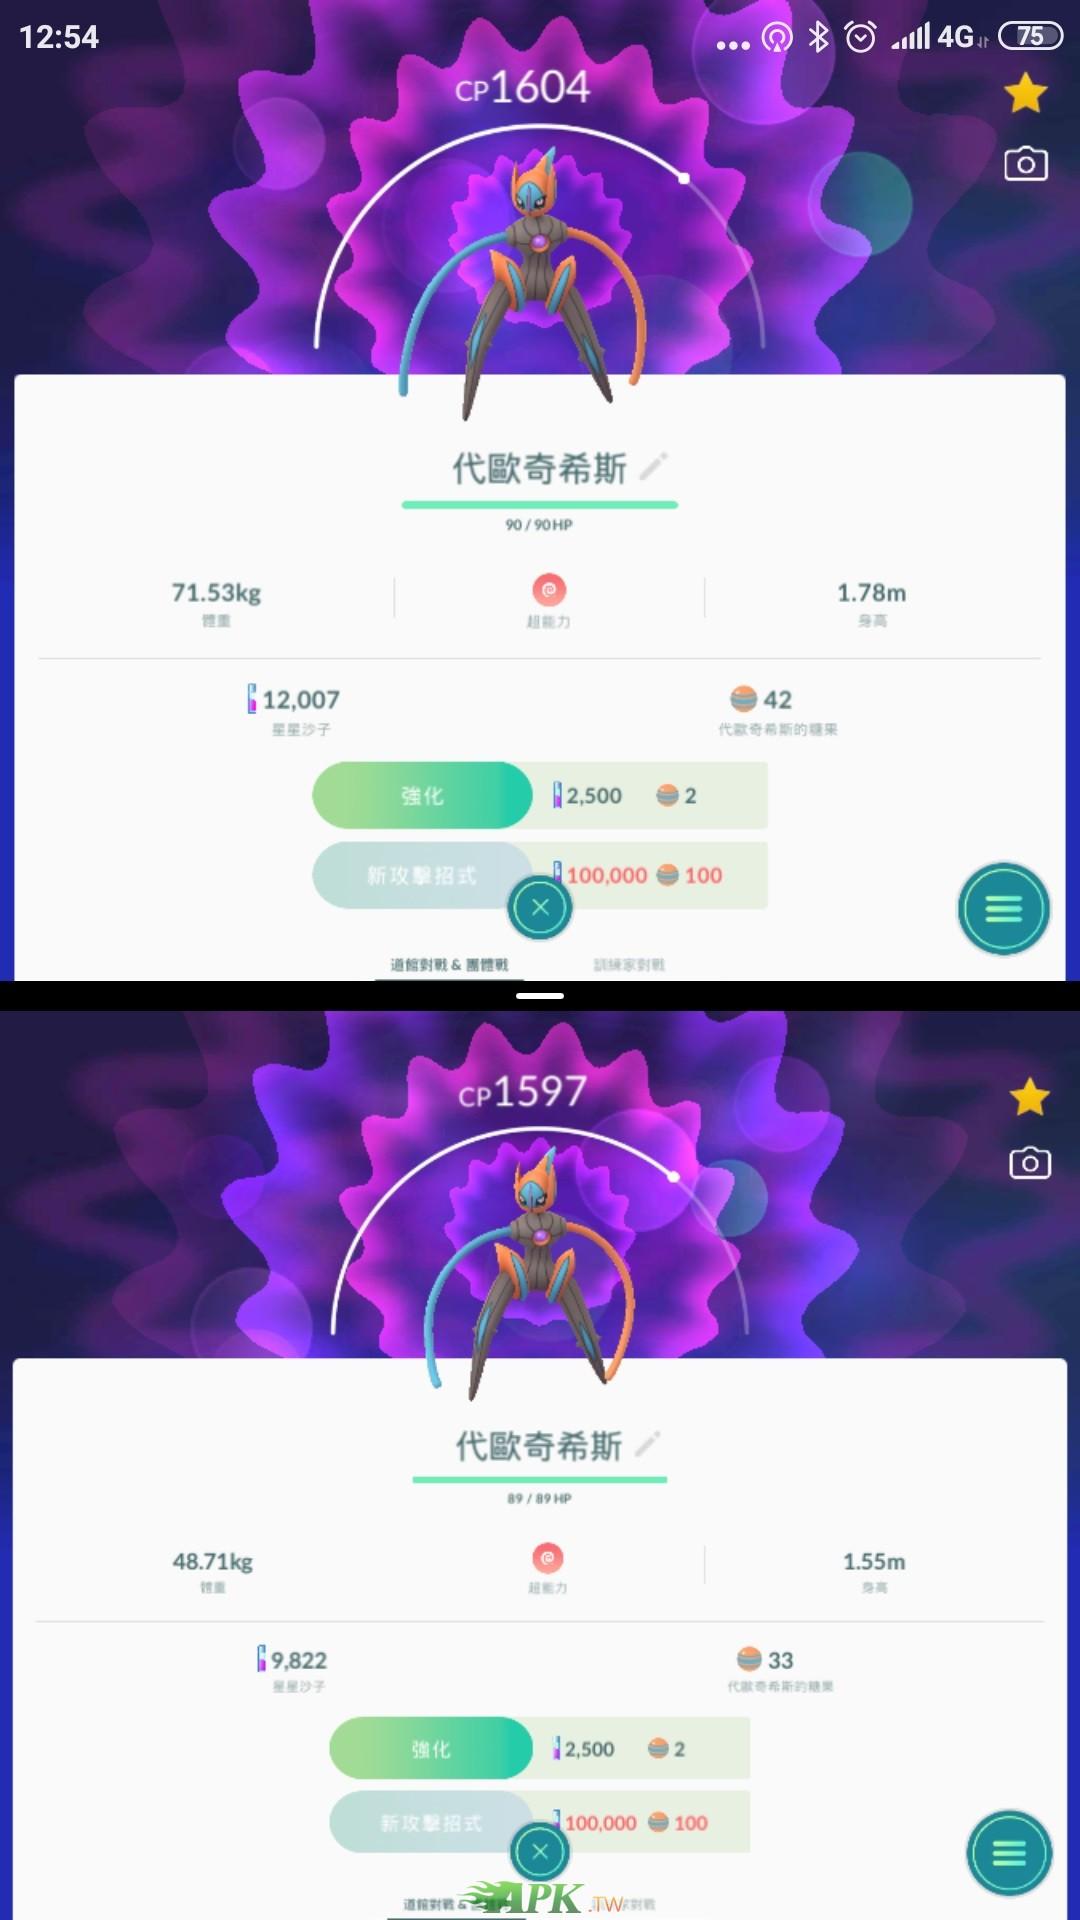 Screenshot_2019-07-02-12-54-19-503_com.nianticlabs.pokemongo.jpg